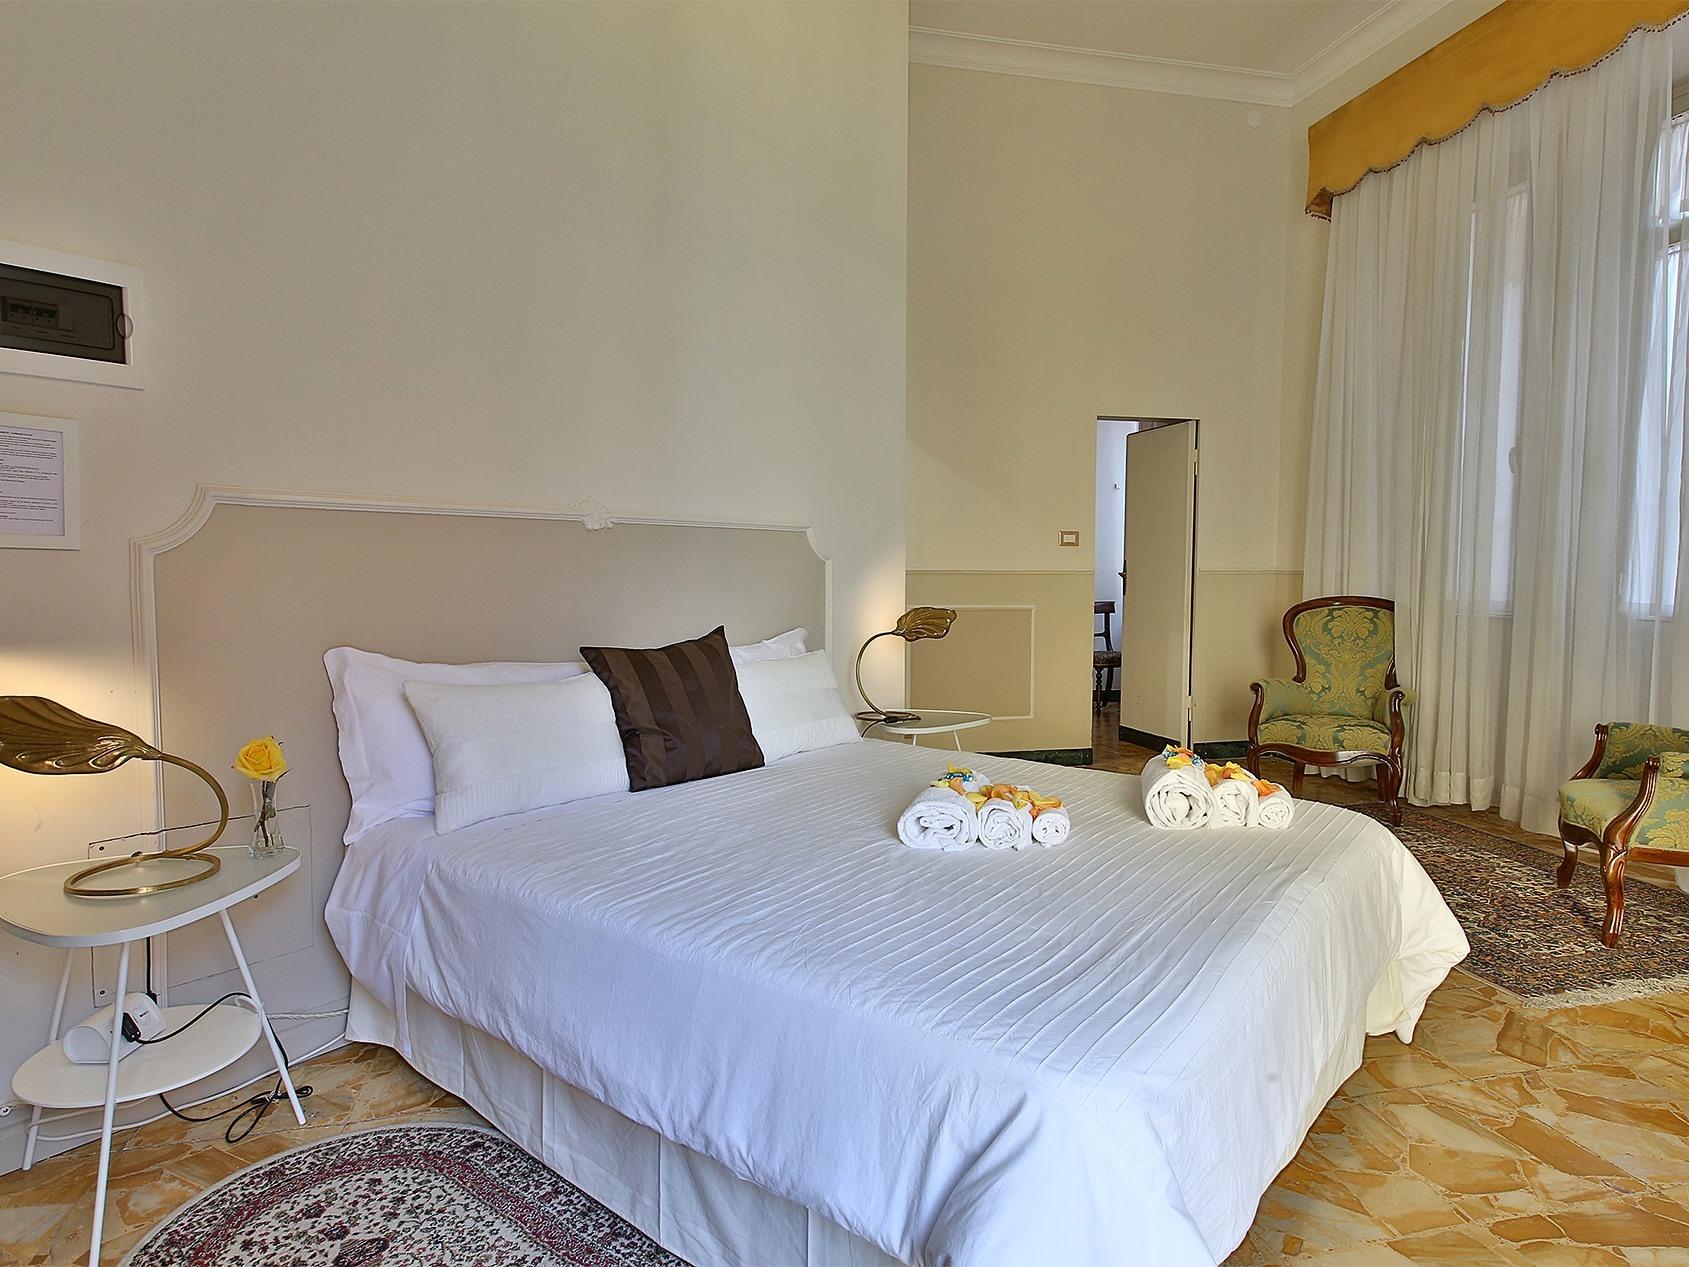 Suite-Suite-Suite-Bagno in camera con doccia-Balcone